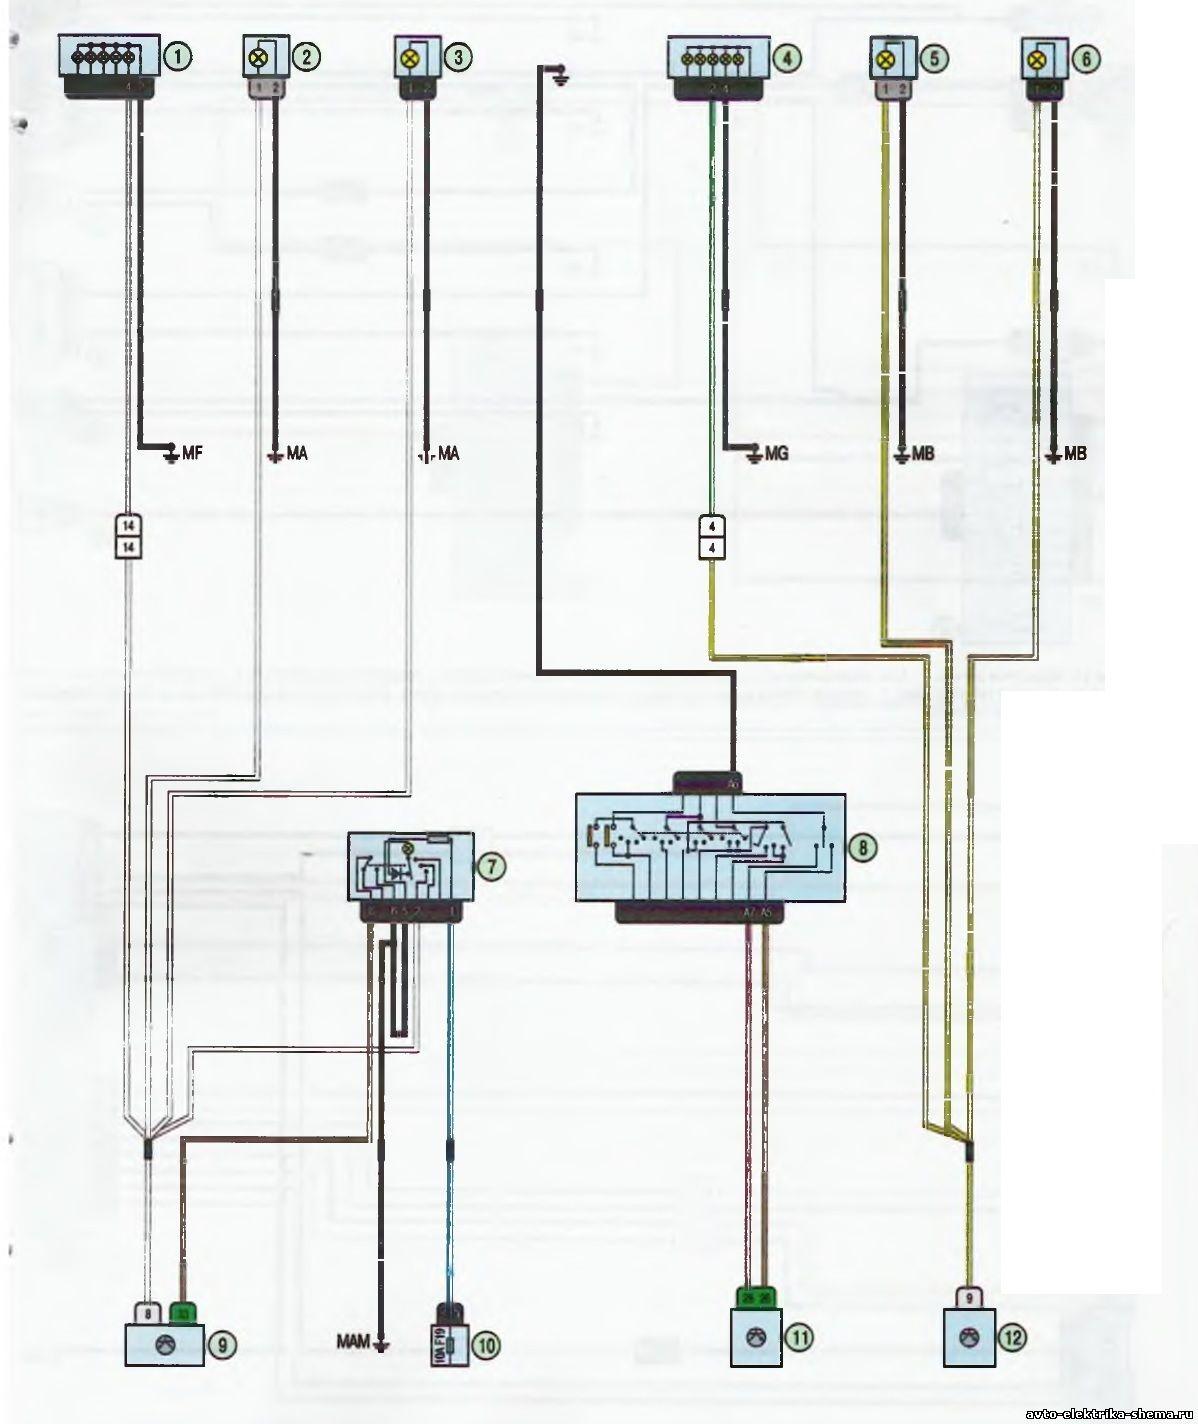 s11 - Схема центрального замка ларгус